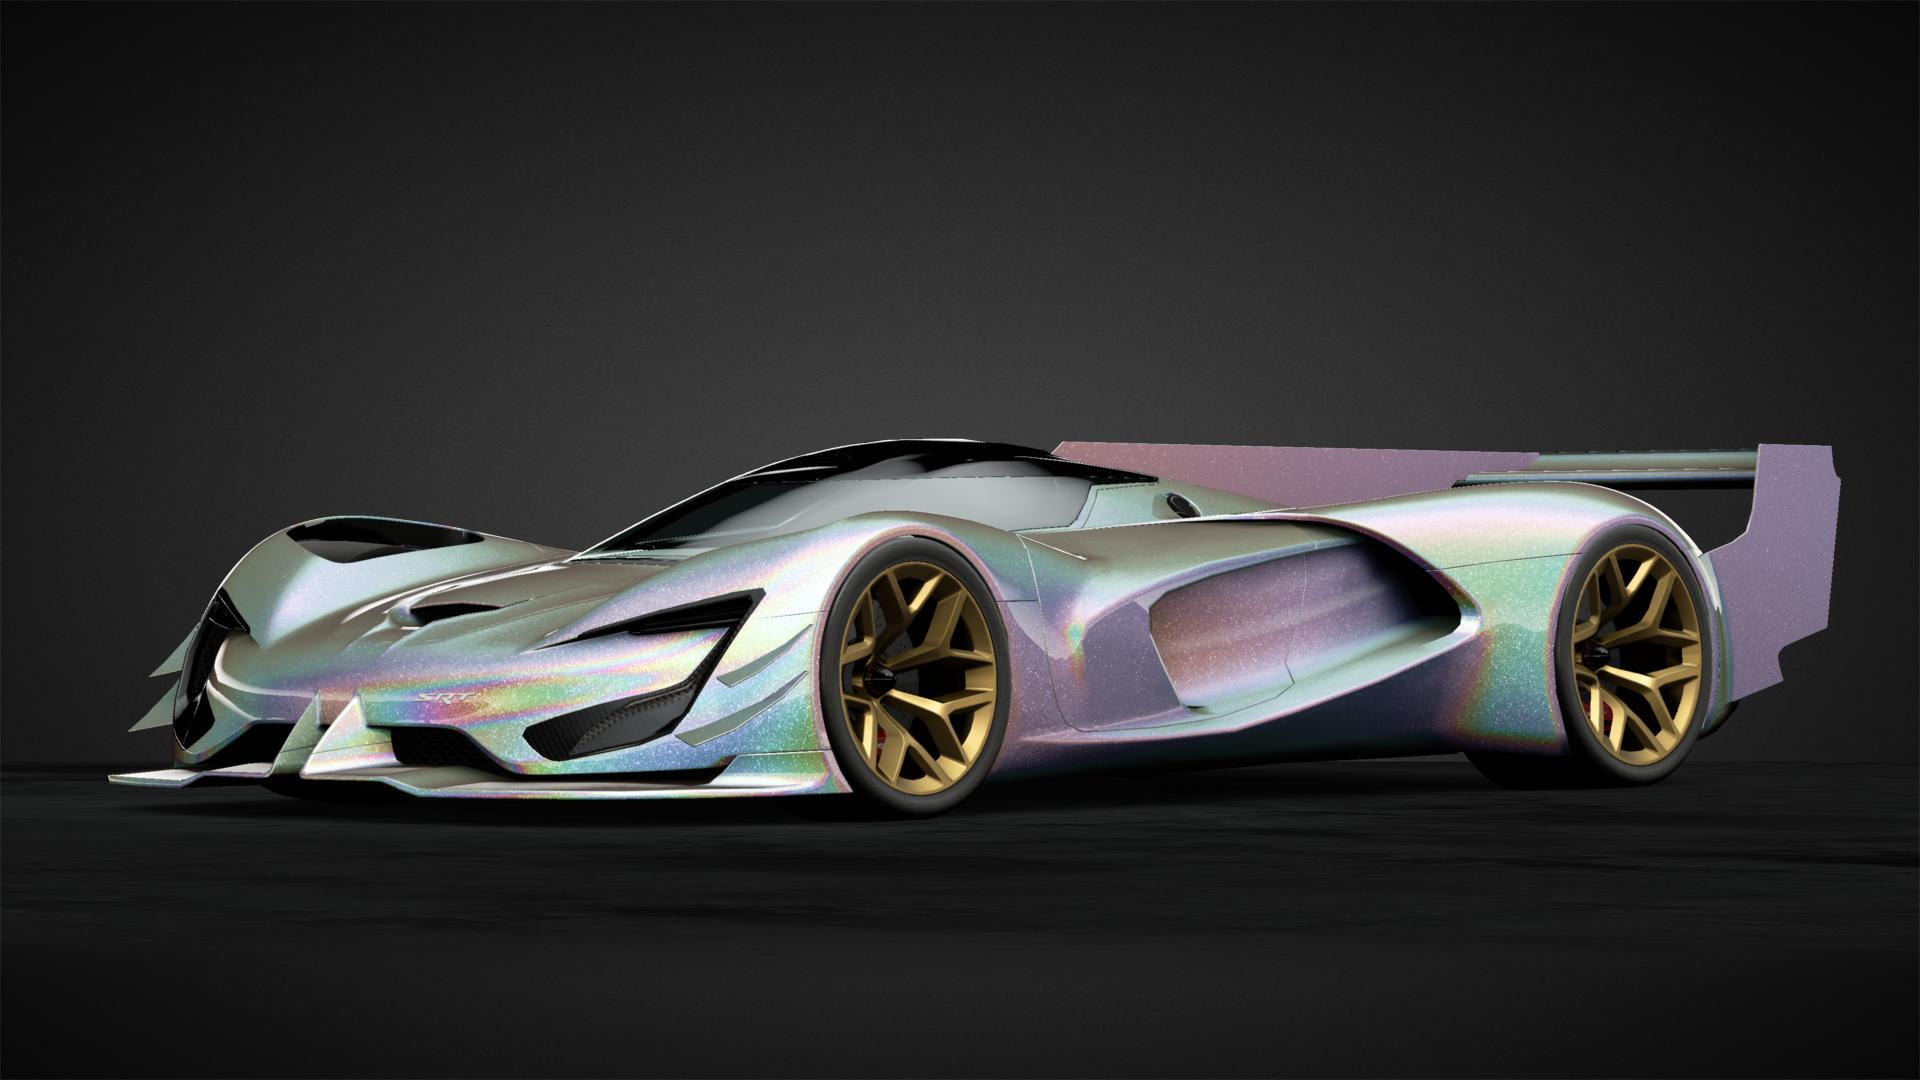 BMW's Ugliest Concept Car Inspired Puma